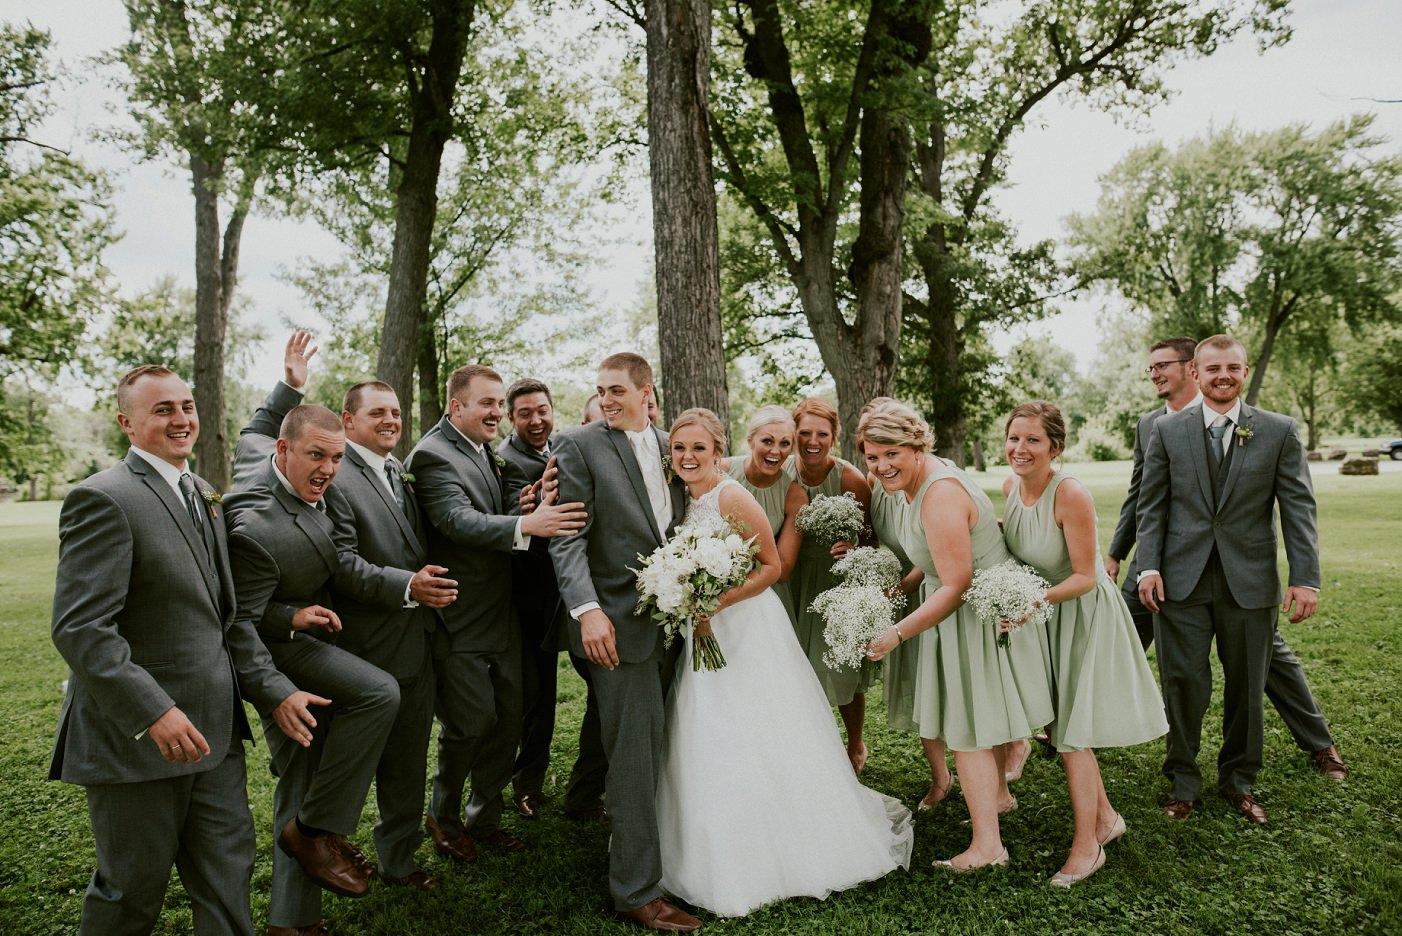 Green and Grey Wedding at Pettibone Park in La Crosse WI